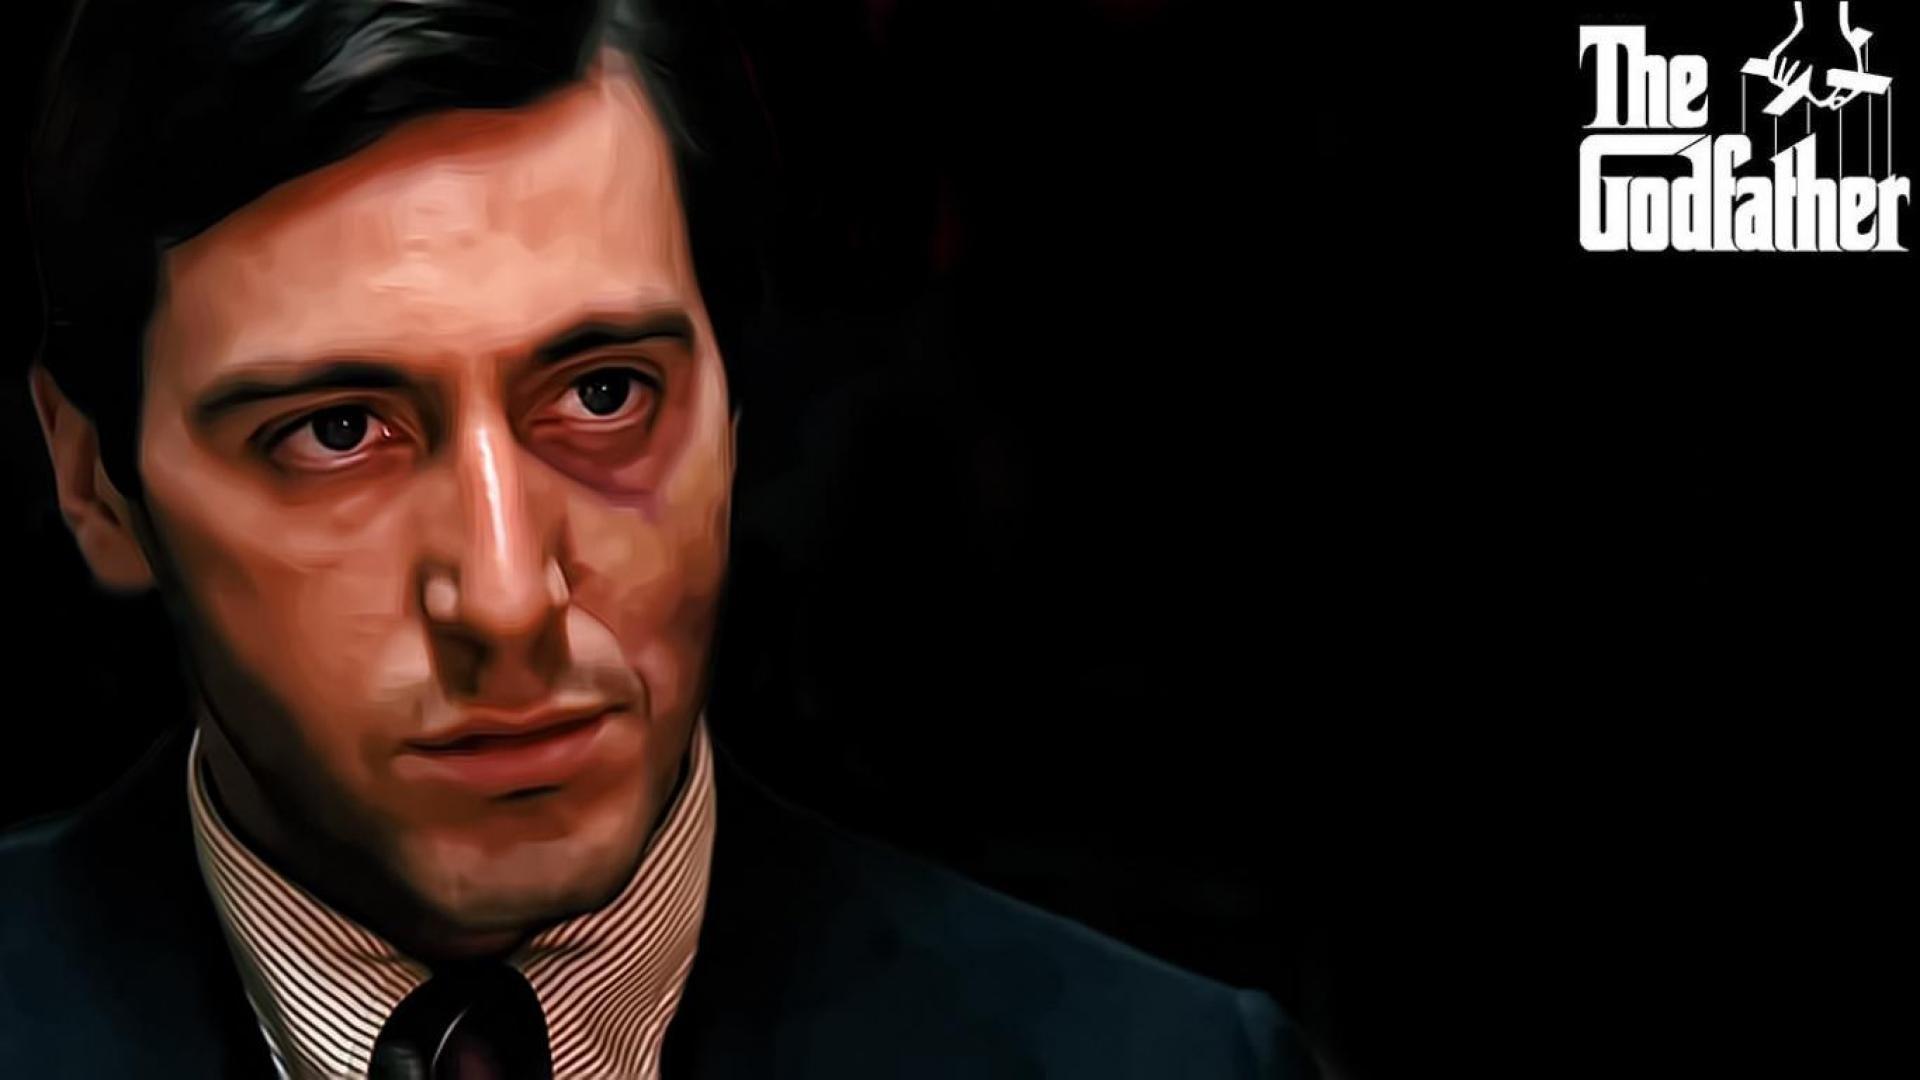 Al Pacino Wallpapers 1920x1080, - HD Wallpaper